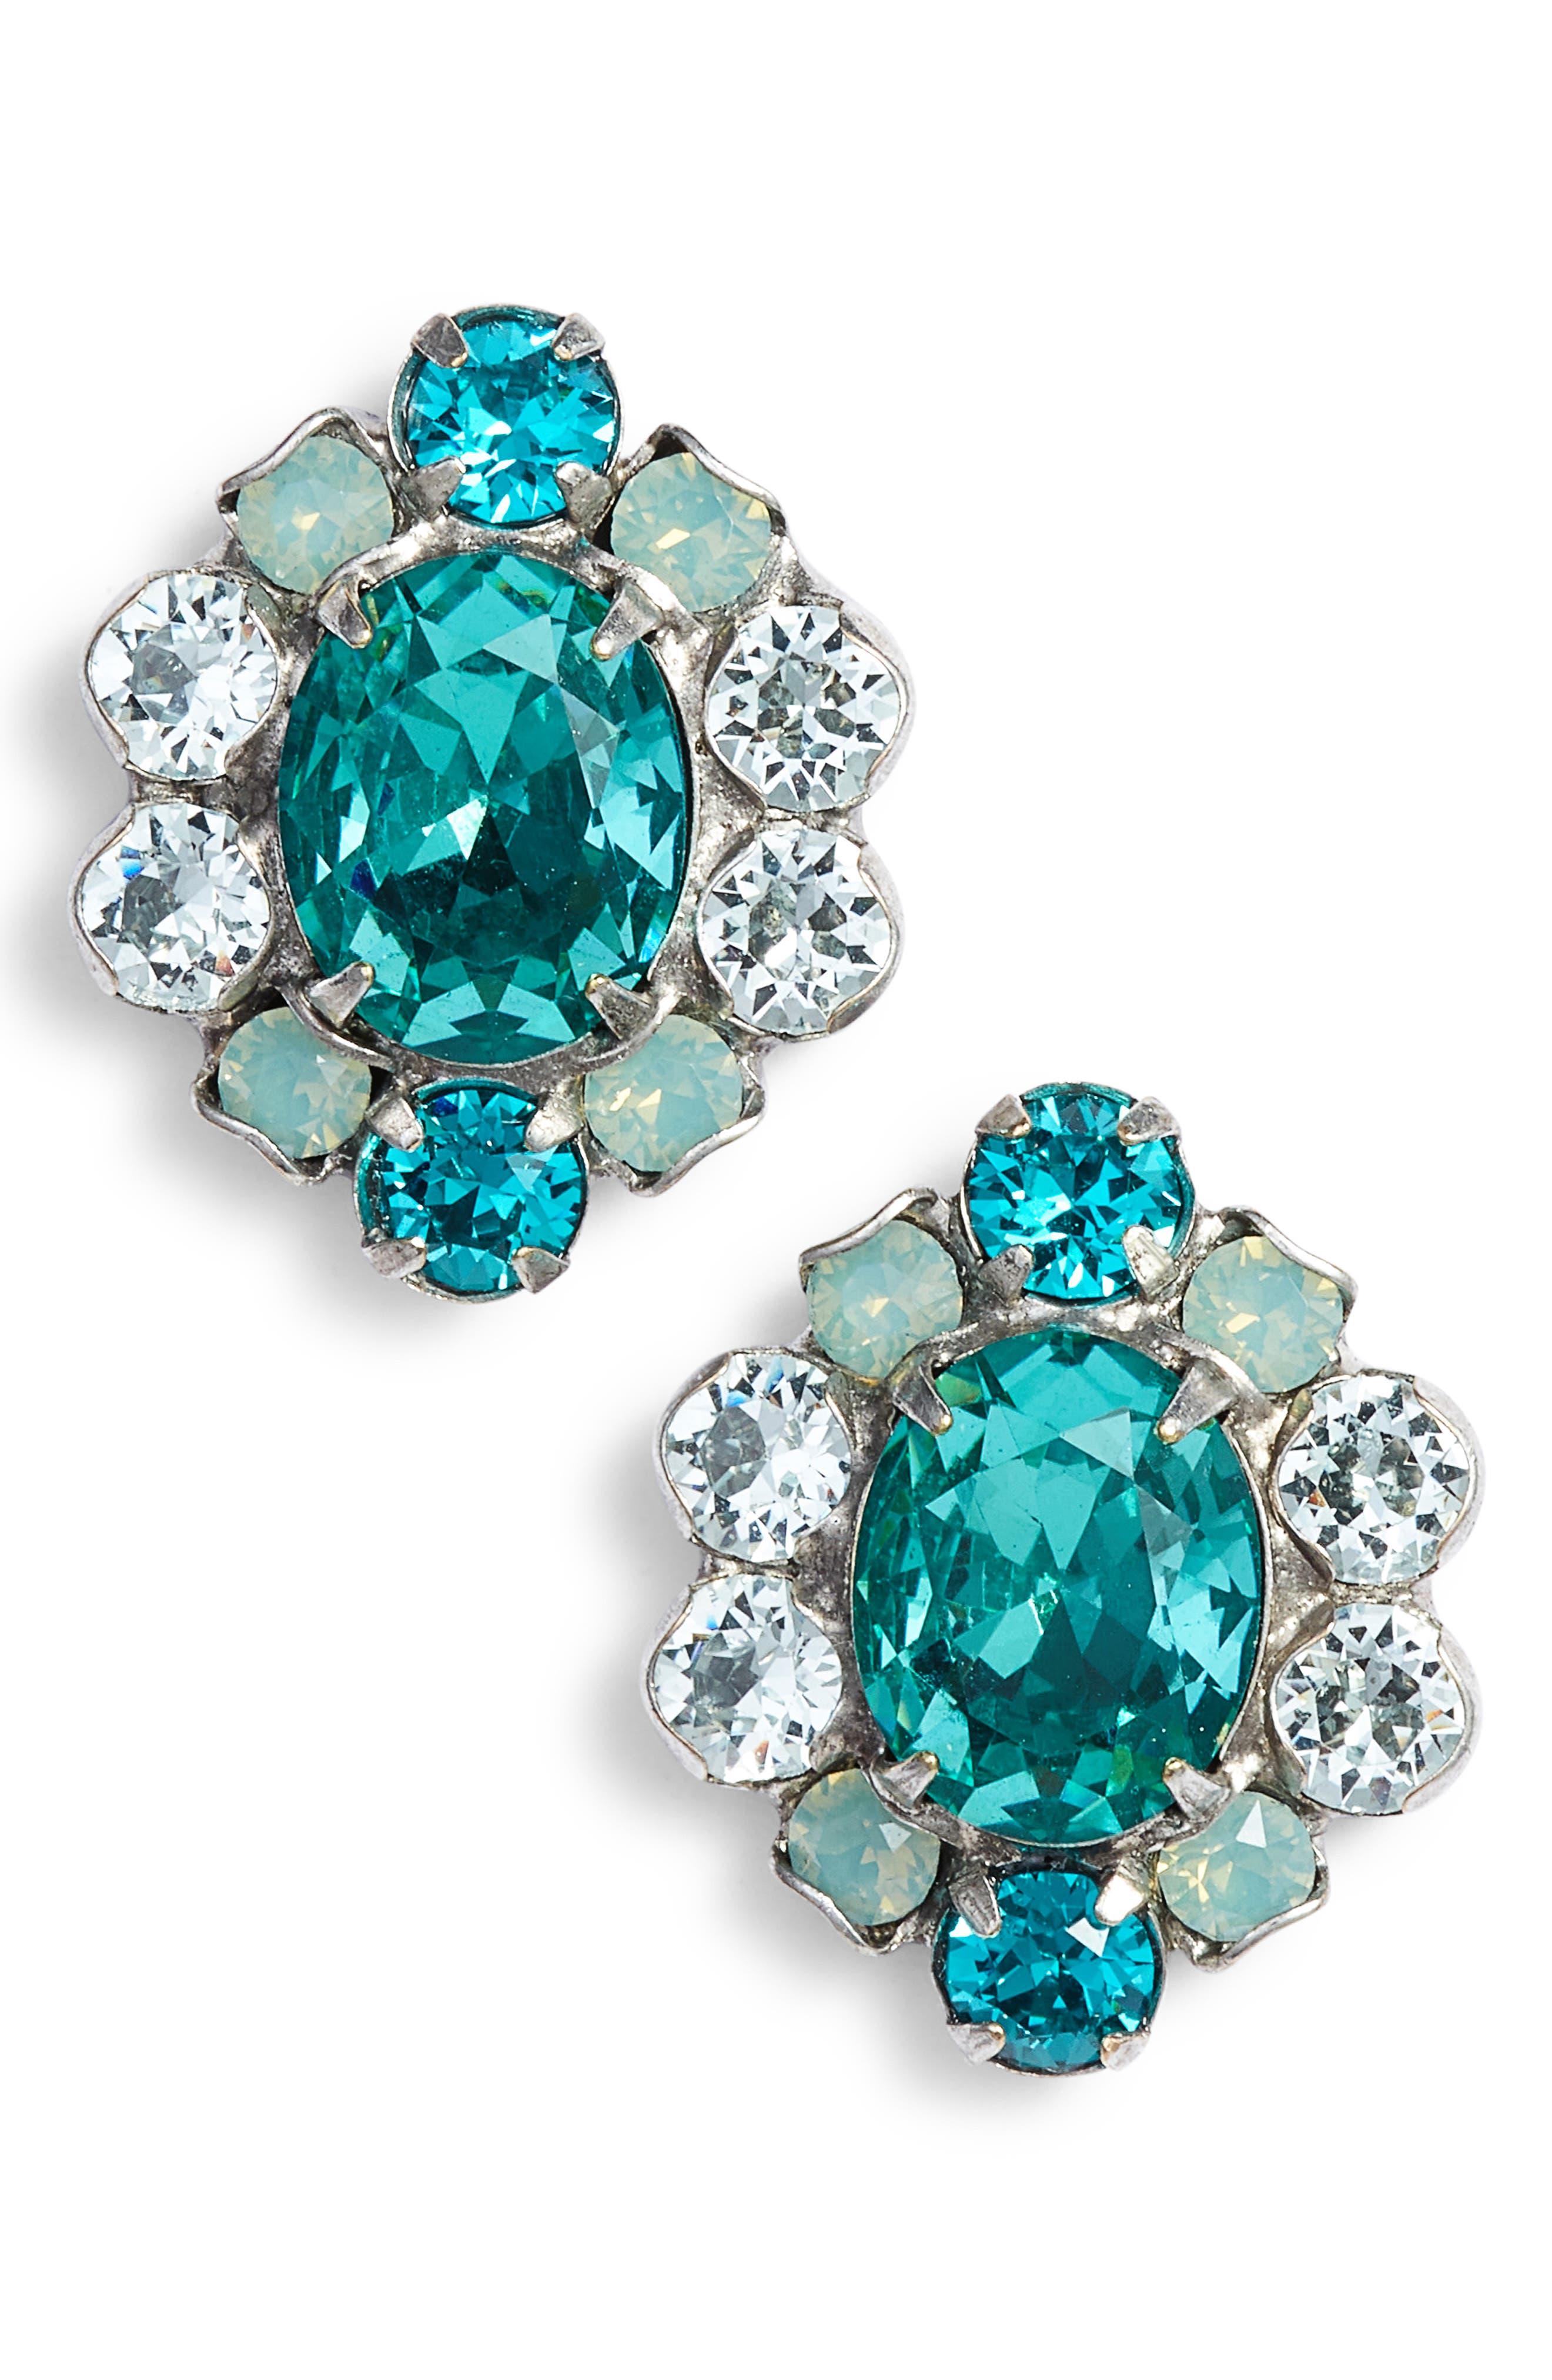 Sundrop Crystal Earrings,                         Main,                         color, BLUE-GREEN